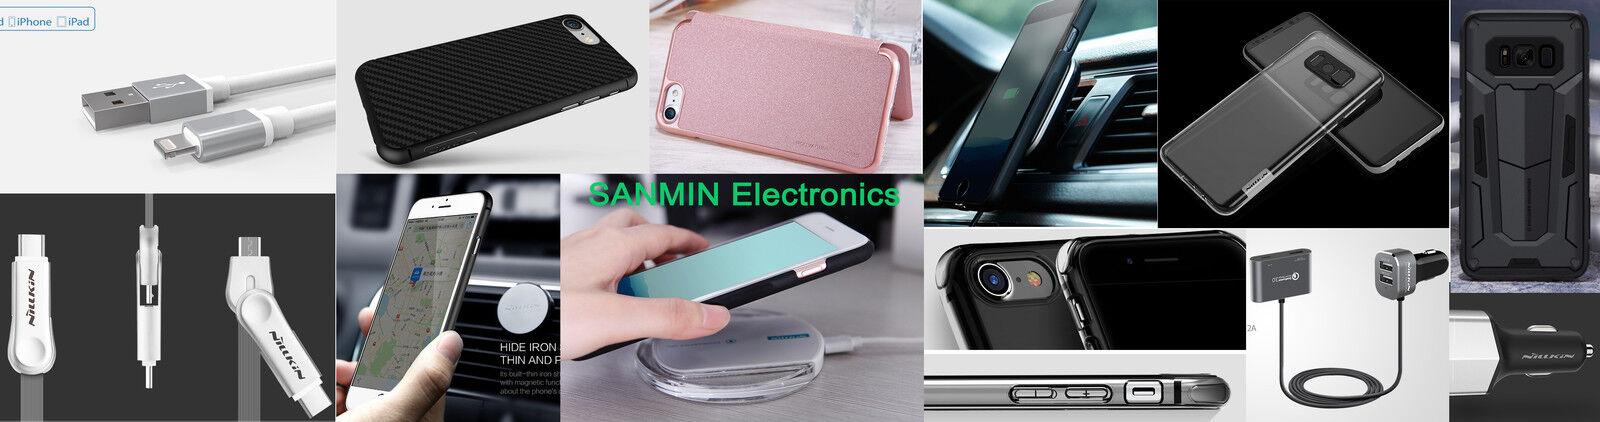 SANMIN Electronics